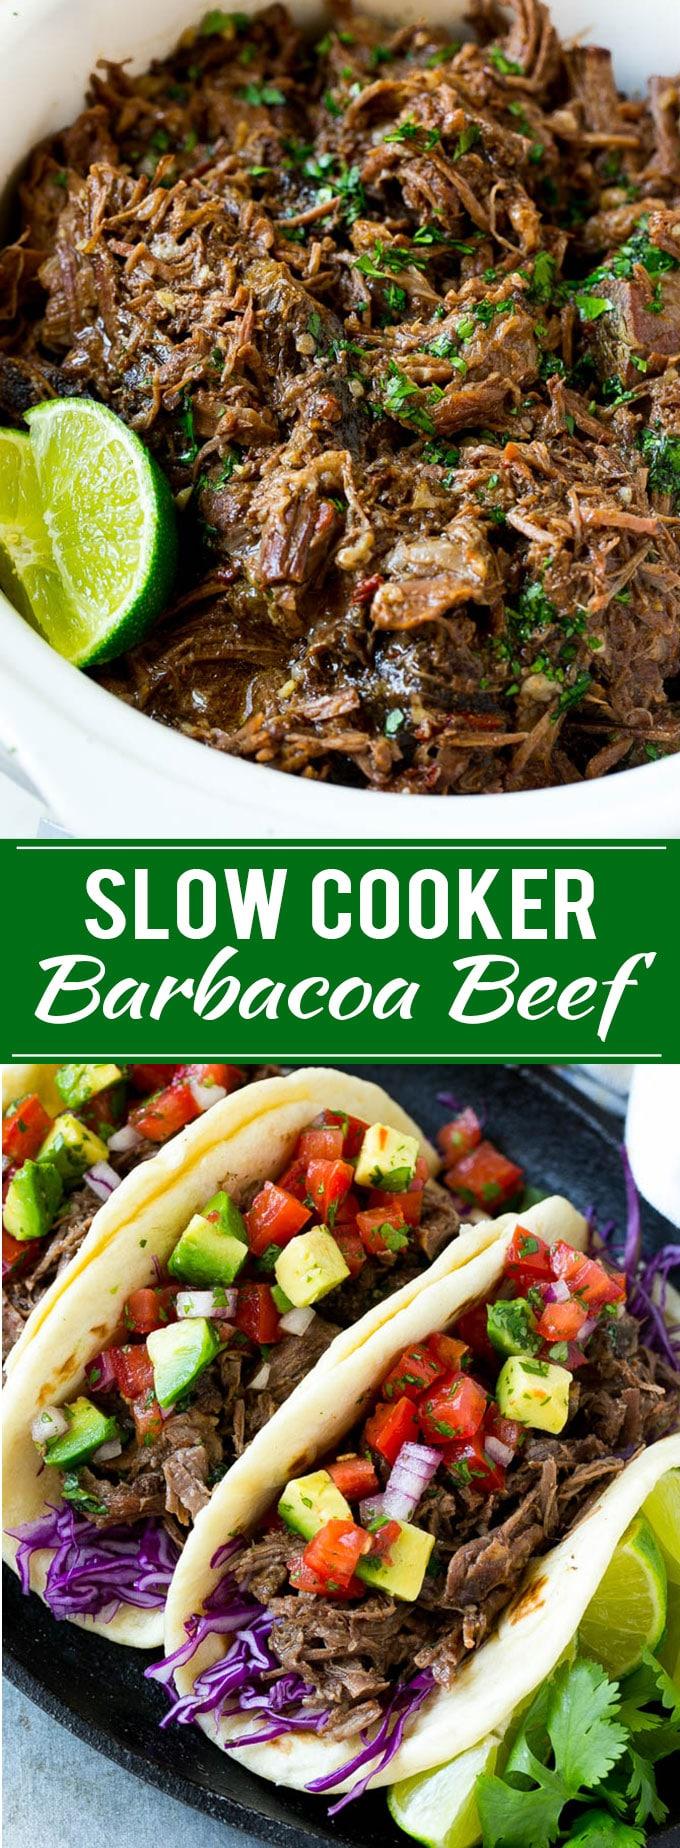 Barbacoa Beef Recipe | Slow Cooker Barbacoa | Chipotle Copycat Recipe | Mexican Beef Recipe